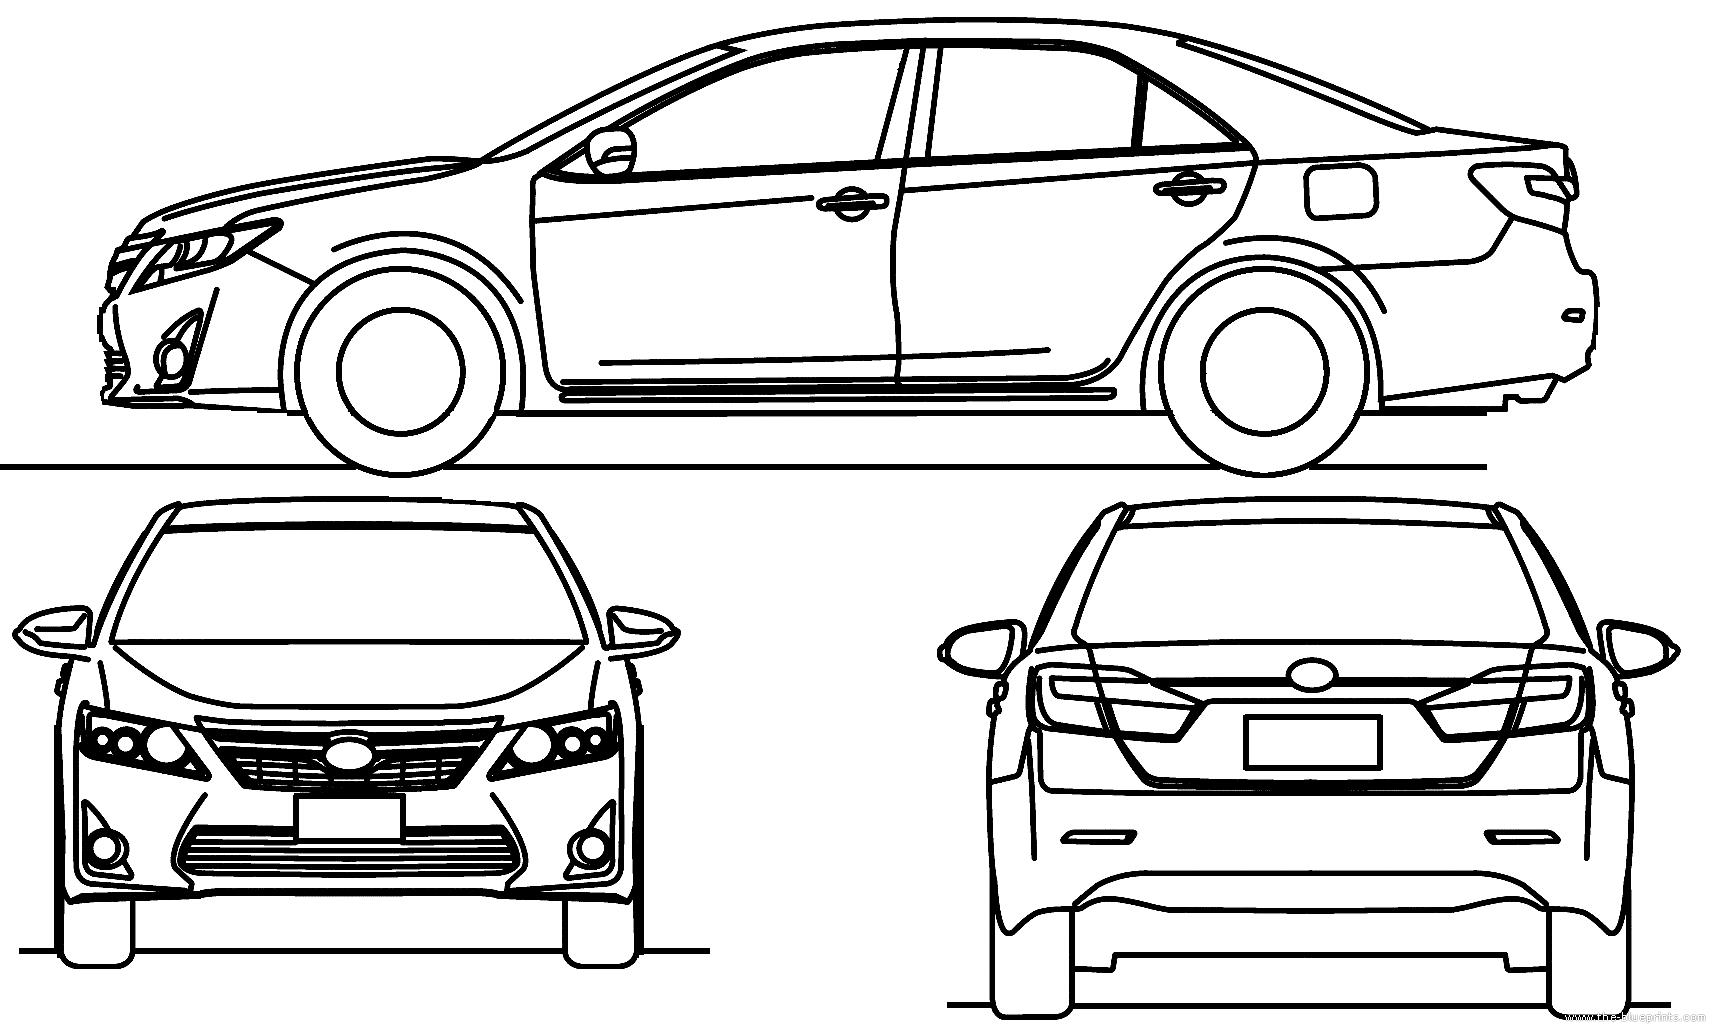 blueprints  u0026gt  cars  u0026gt  toyota  u0026gt  toyota camry  2013